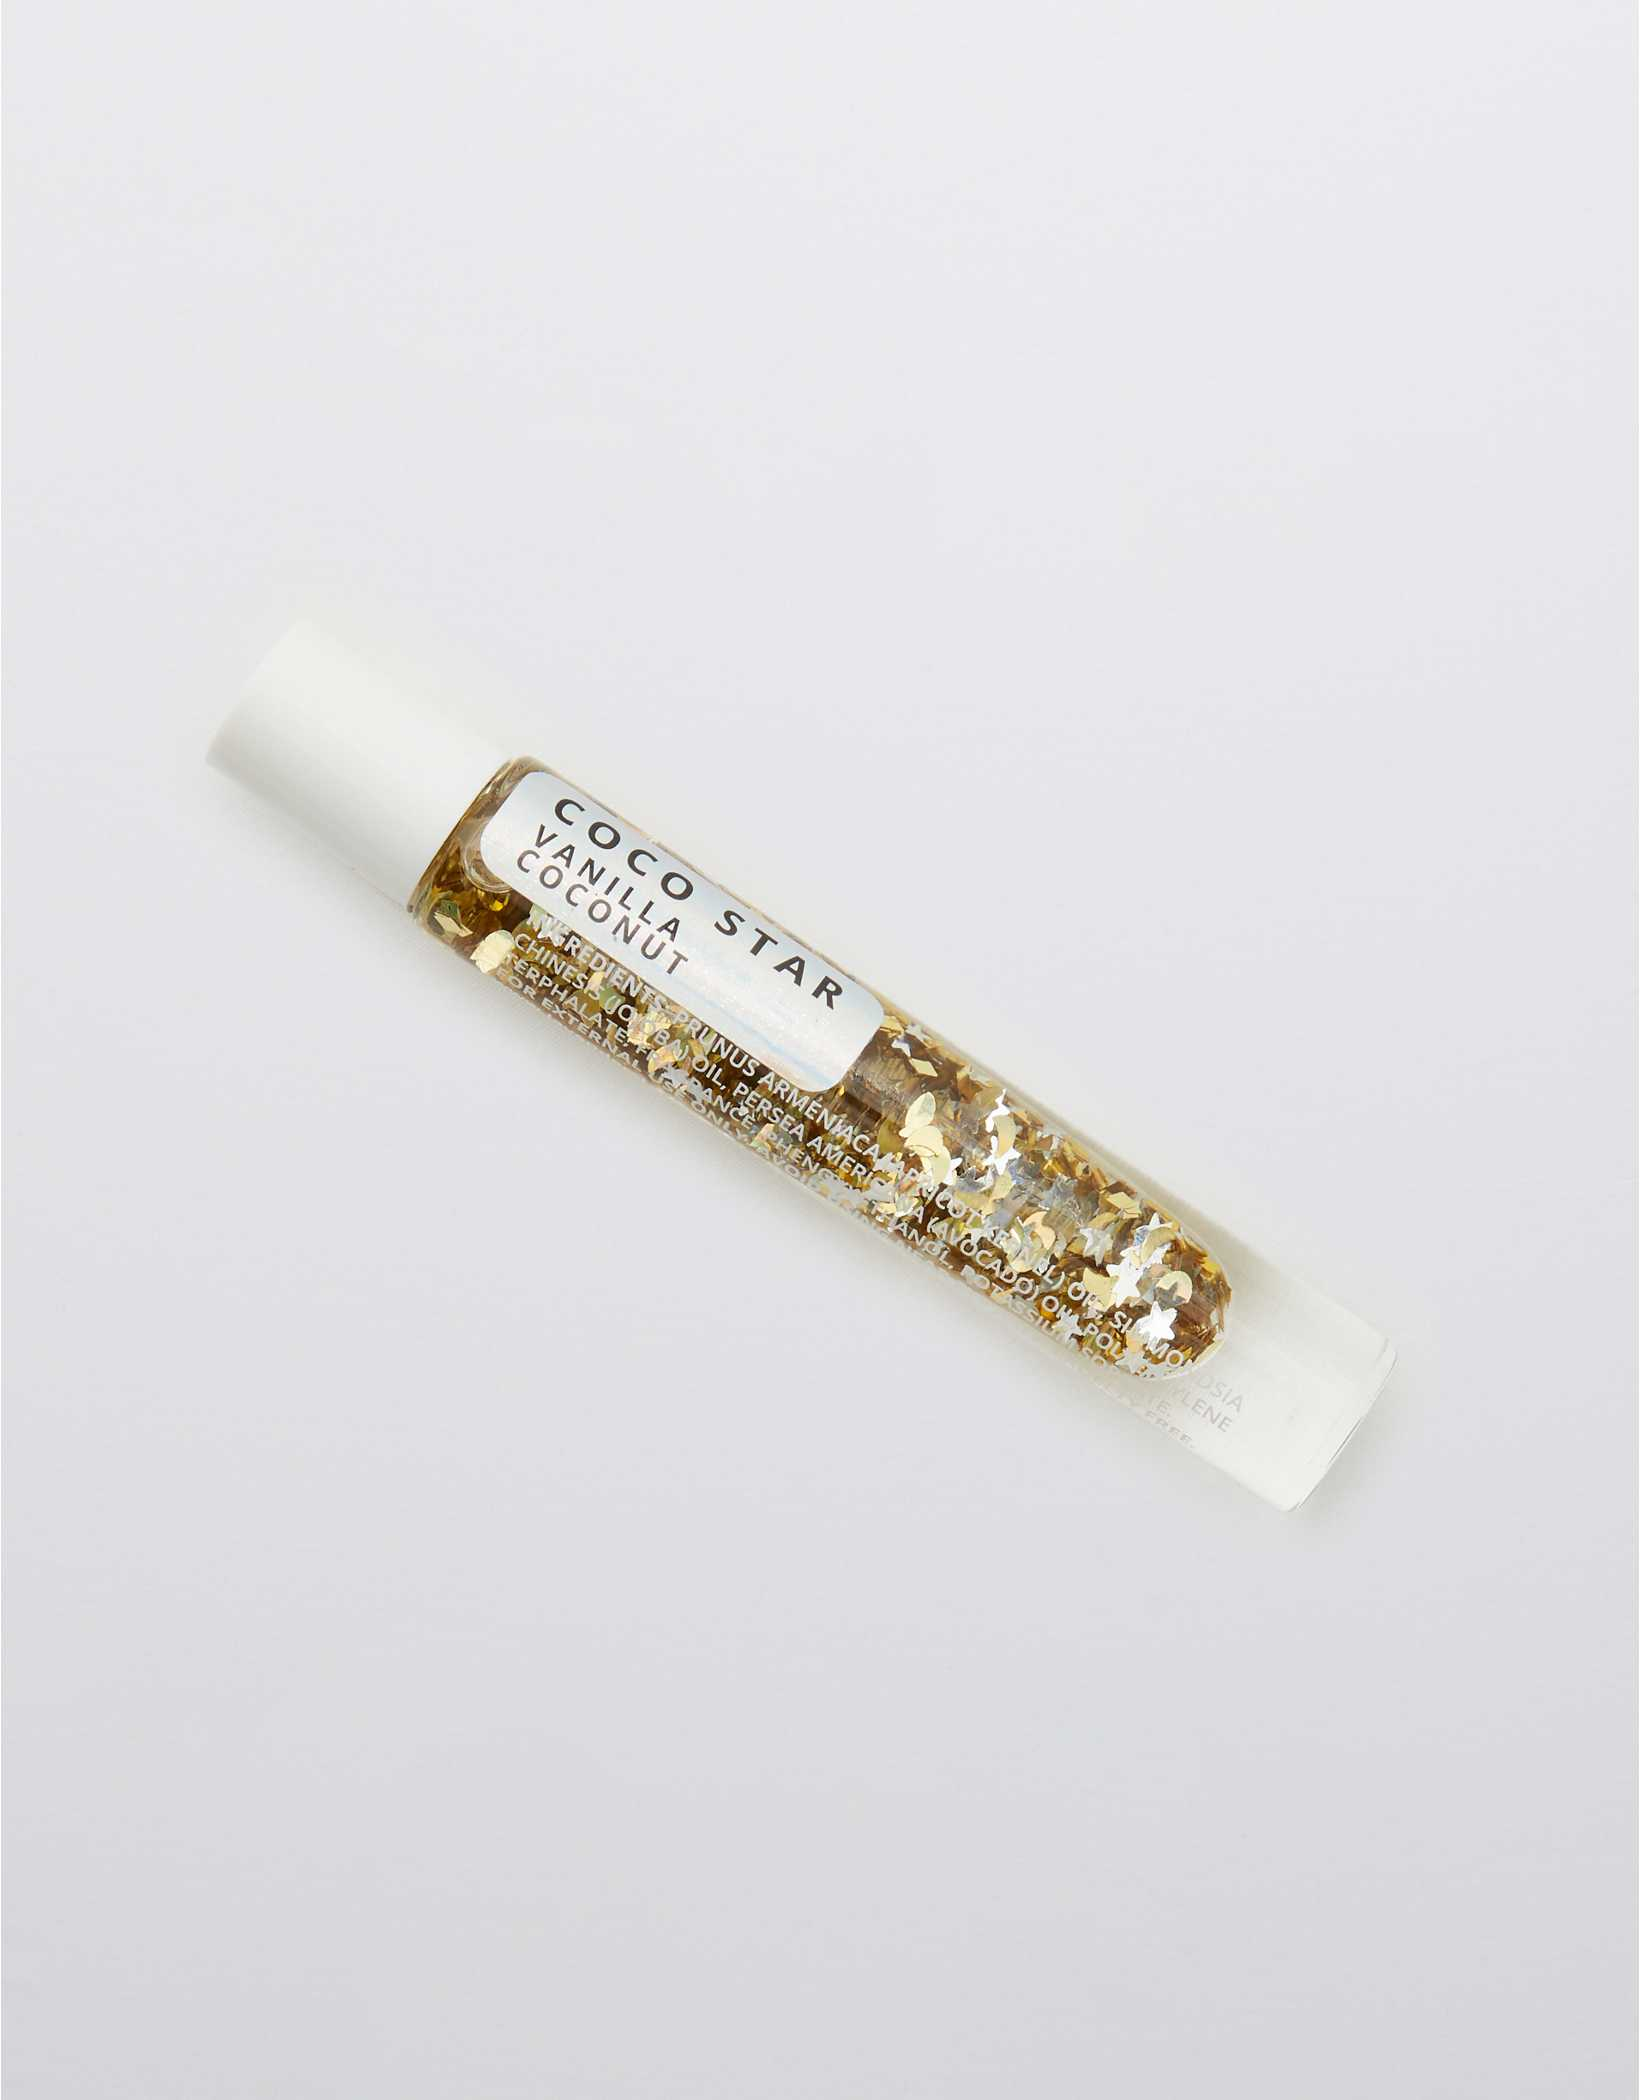 Cocostar Stardust Aromatherapy Oil